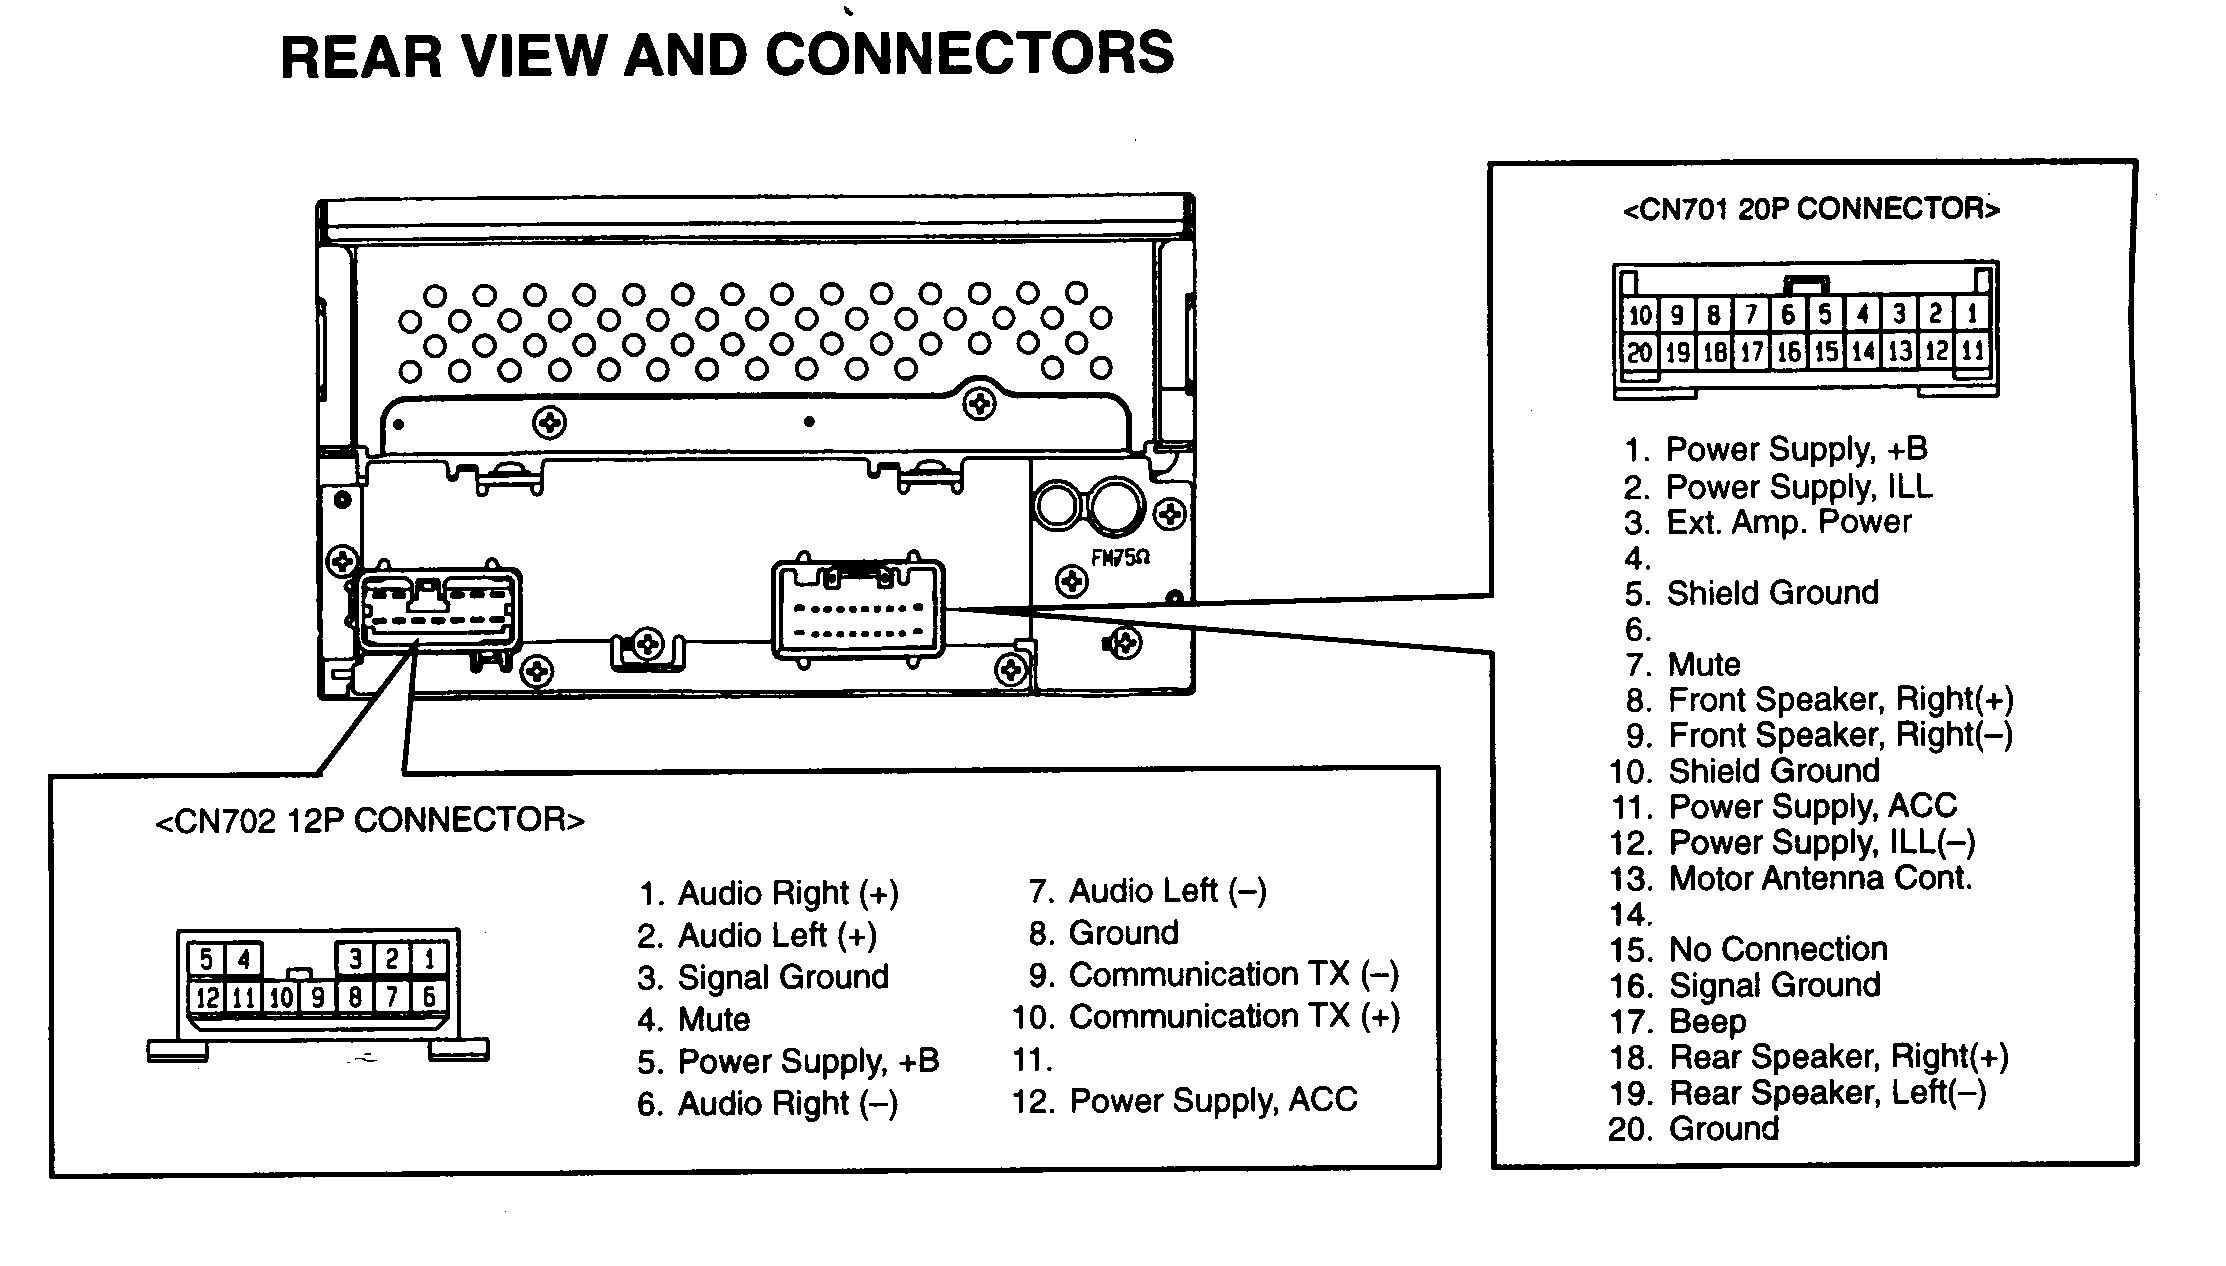 bose companion 5 wiring diagram bose 321 speaker wiring diagram auto wiring diagrams  bose 321 speaker wiring diagram auto